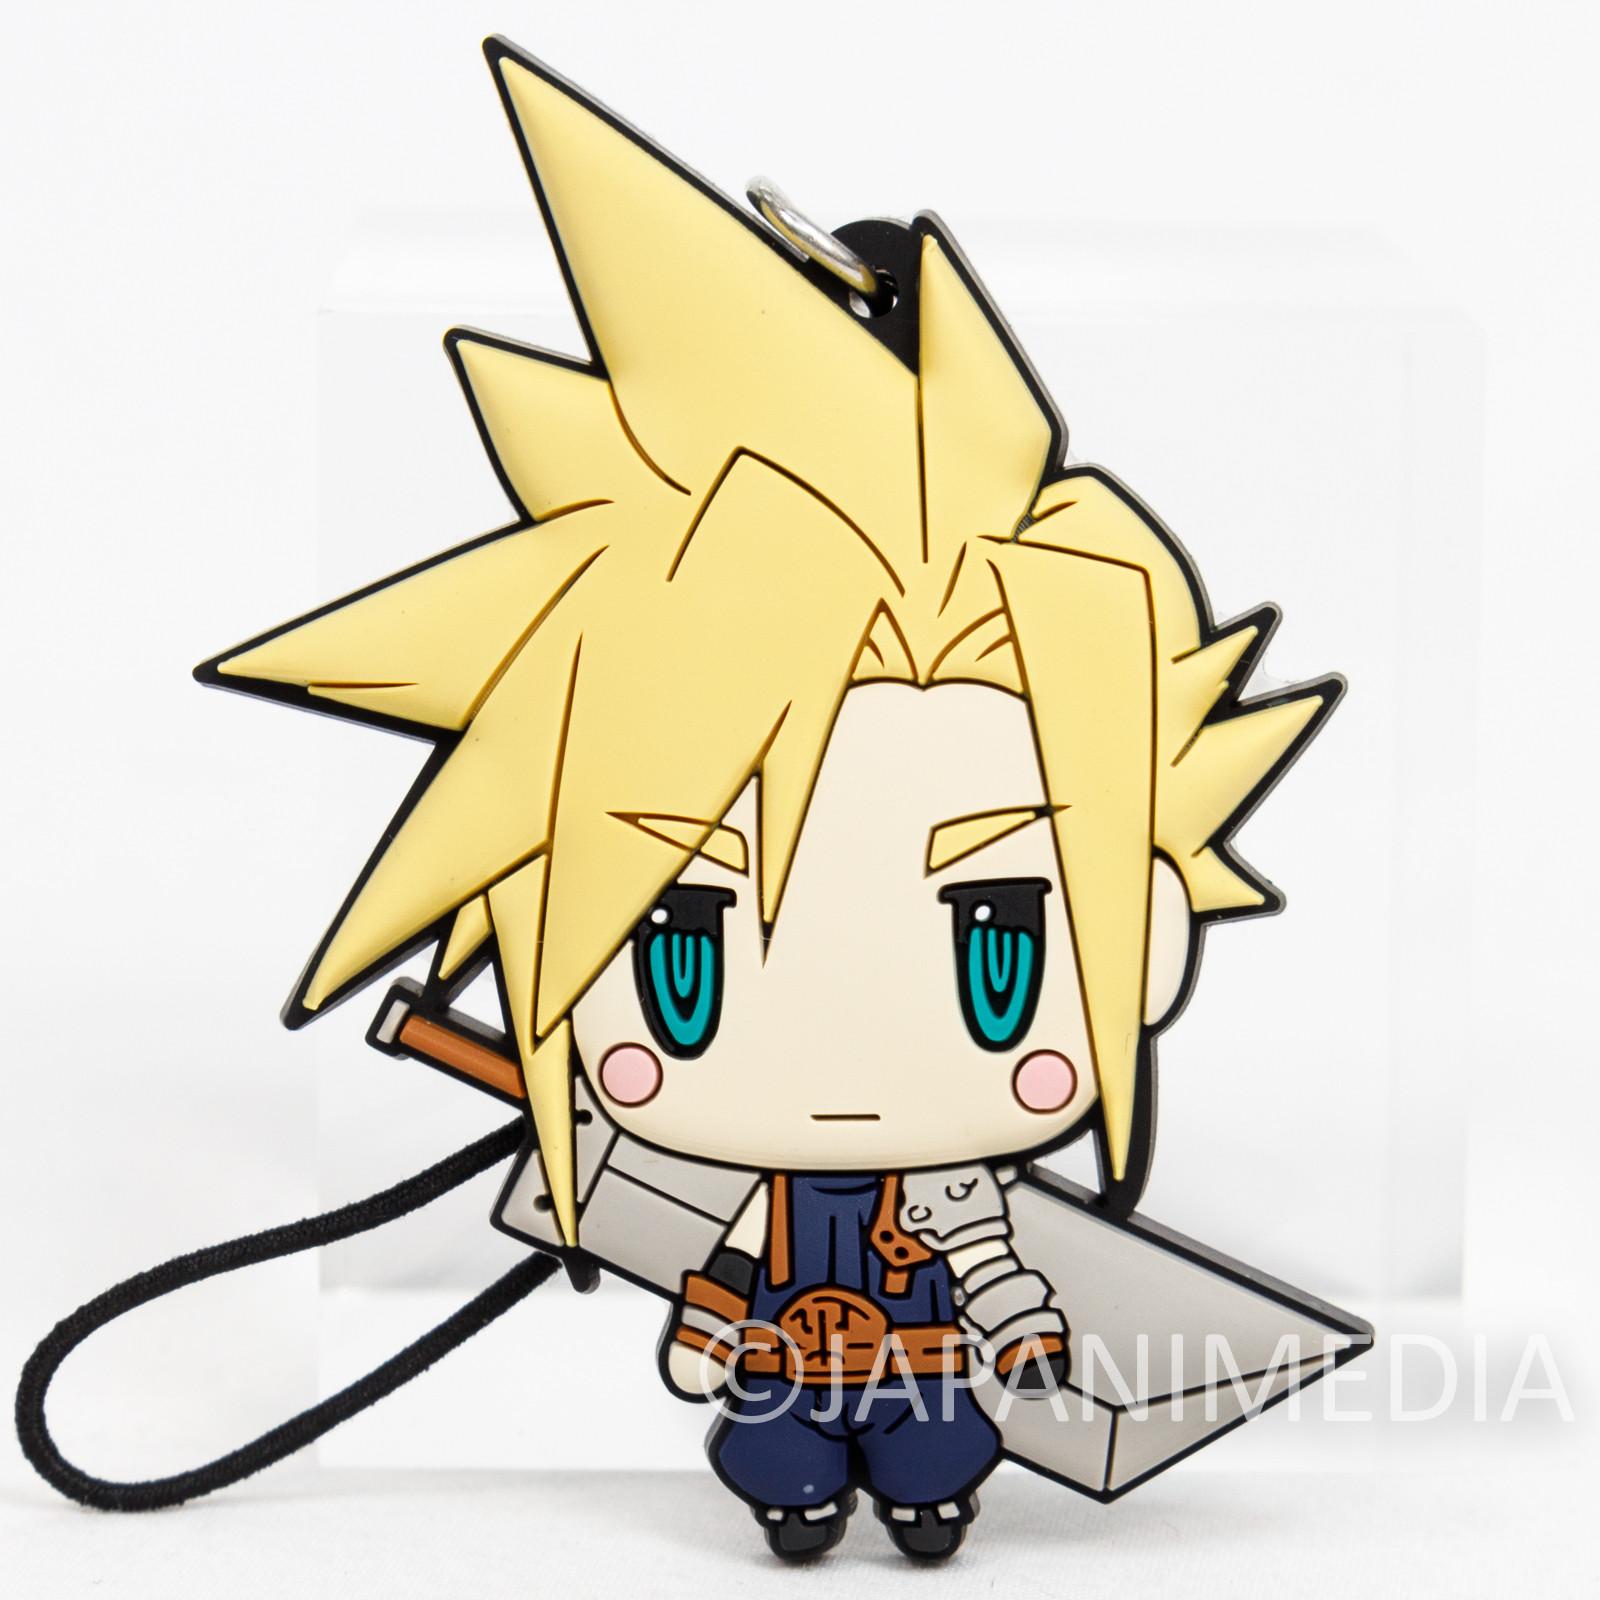 Final Fantasy Cloud Strife Mascot Rubber Strap JAPAN SQUARE ENIX